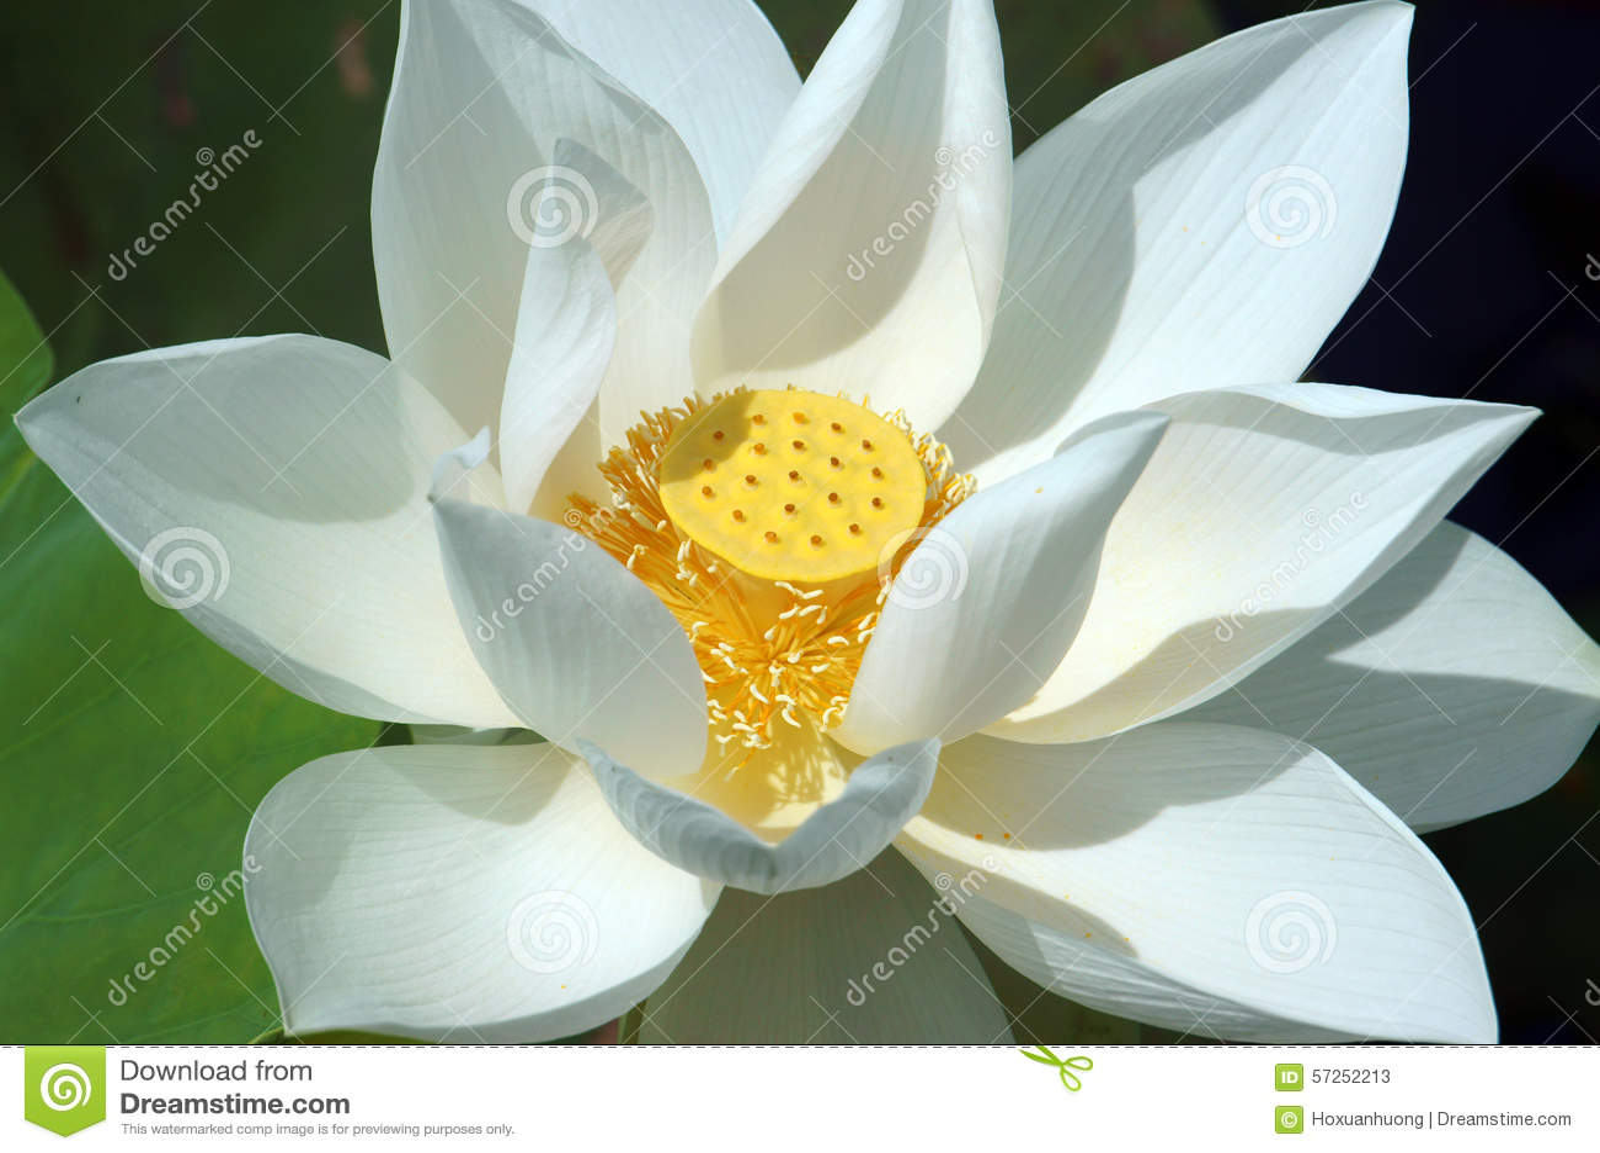 Vietnamese Flower White Lotus Flower Stock Image Image Of Lotus